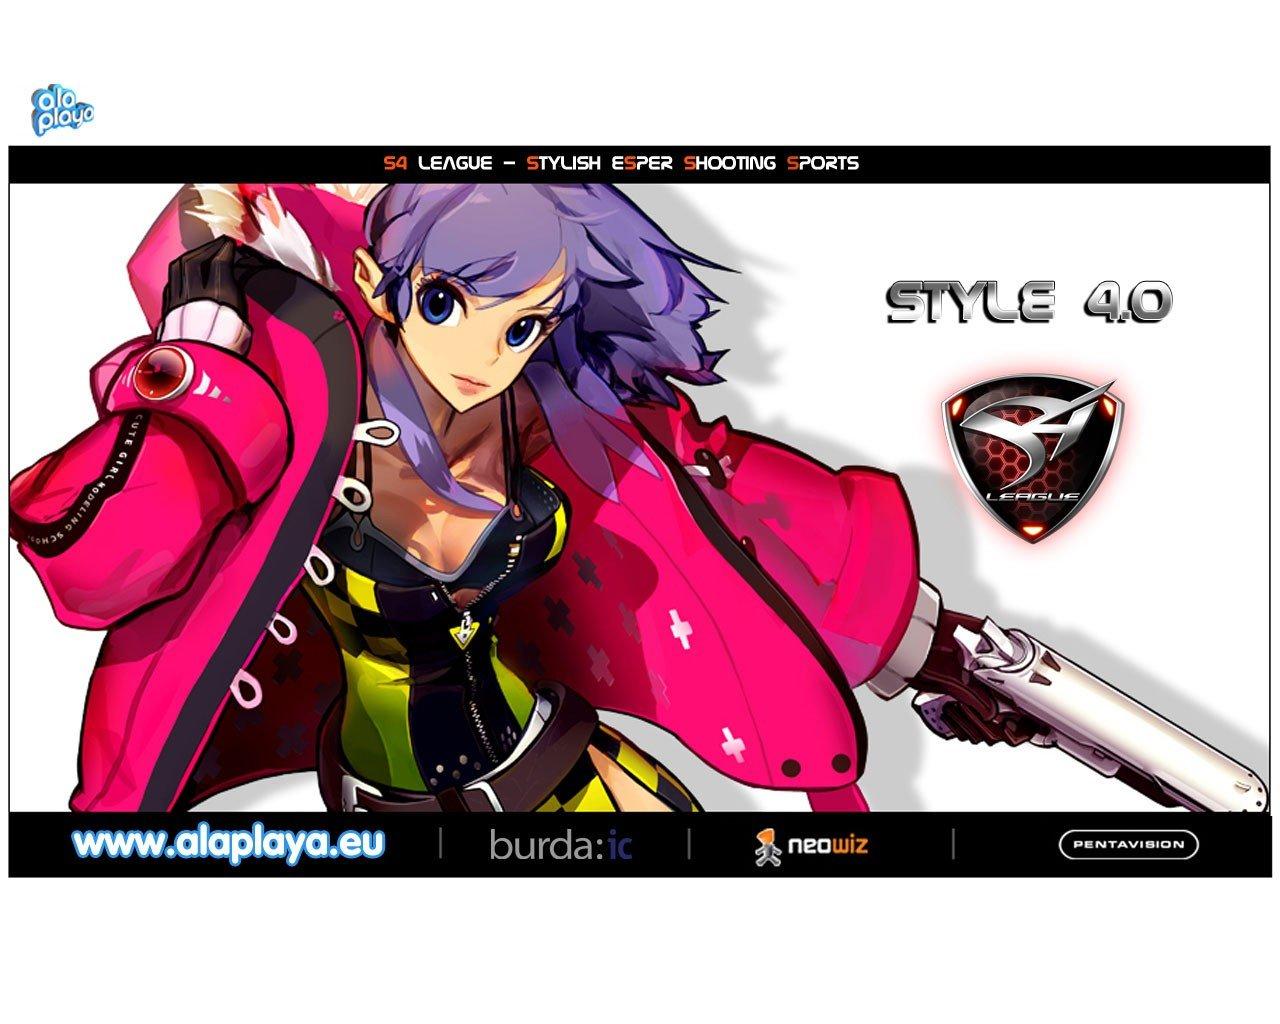 Wallpaper : 1280x1024 px, S4 League, video games 1280x1024